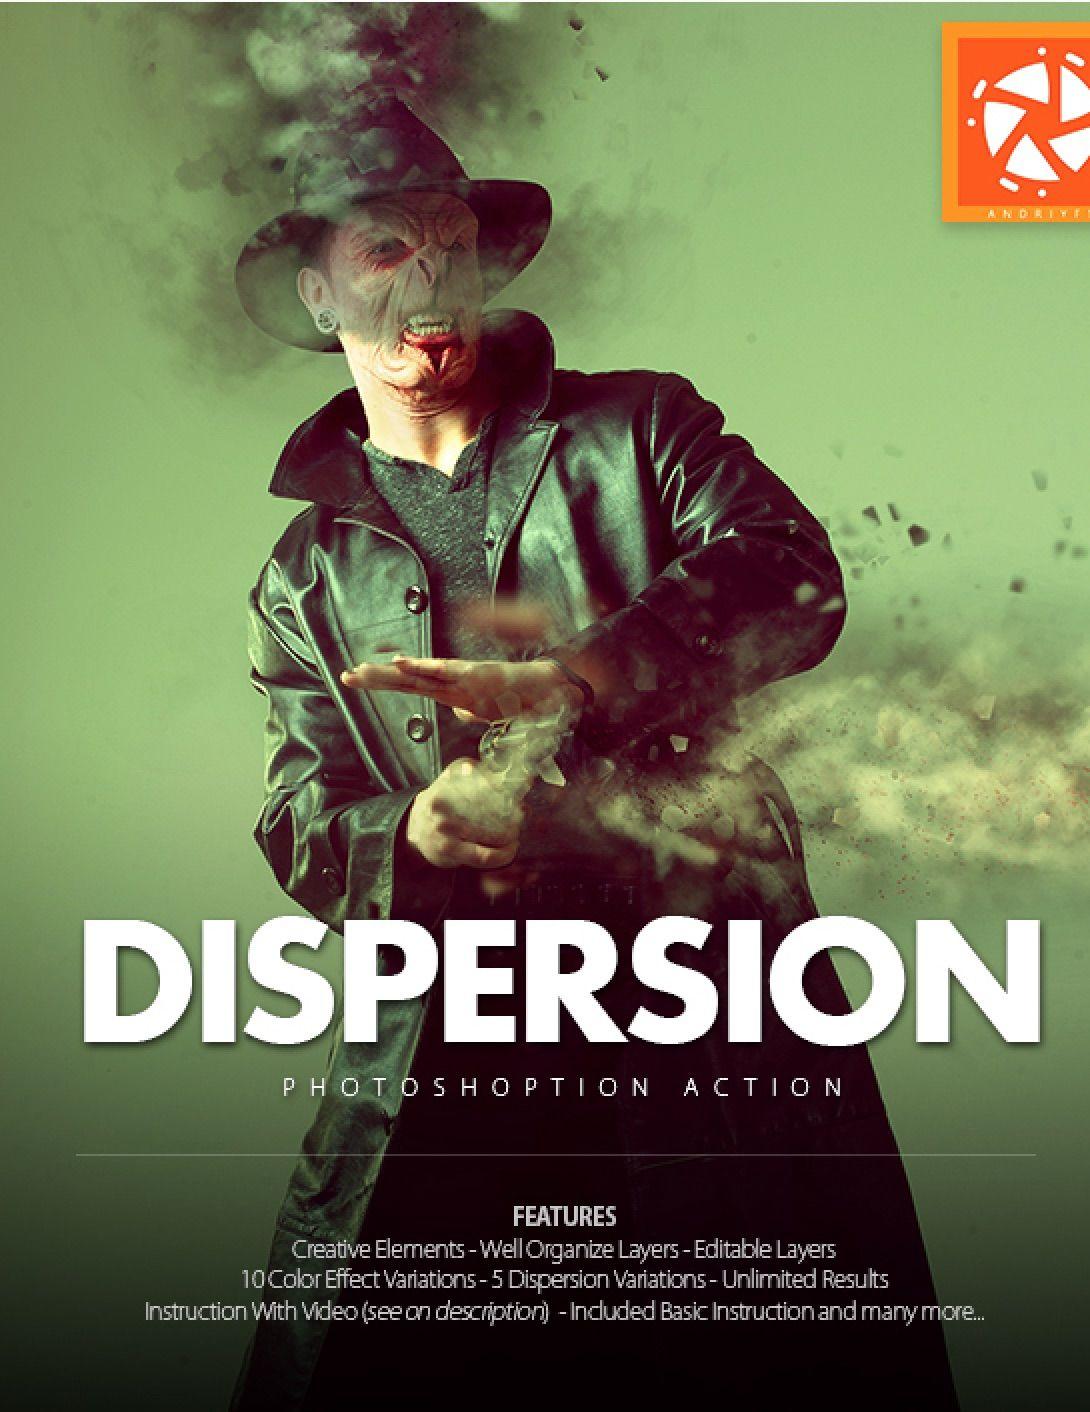 Dispersion #photoshop #action